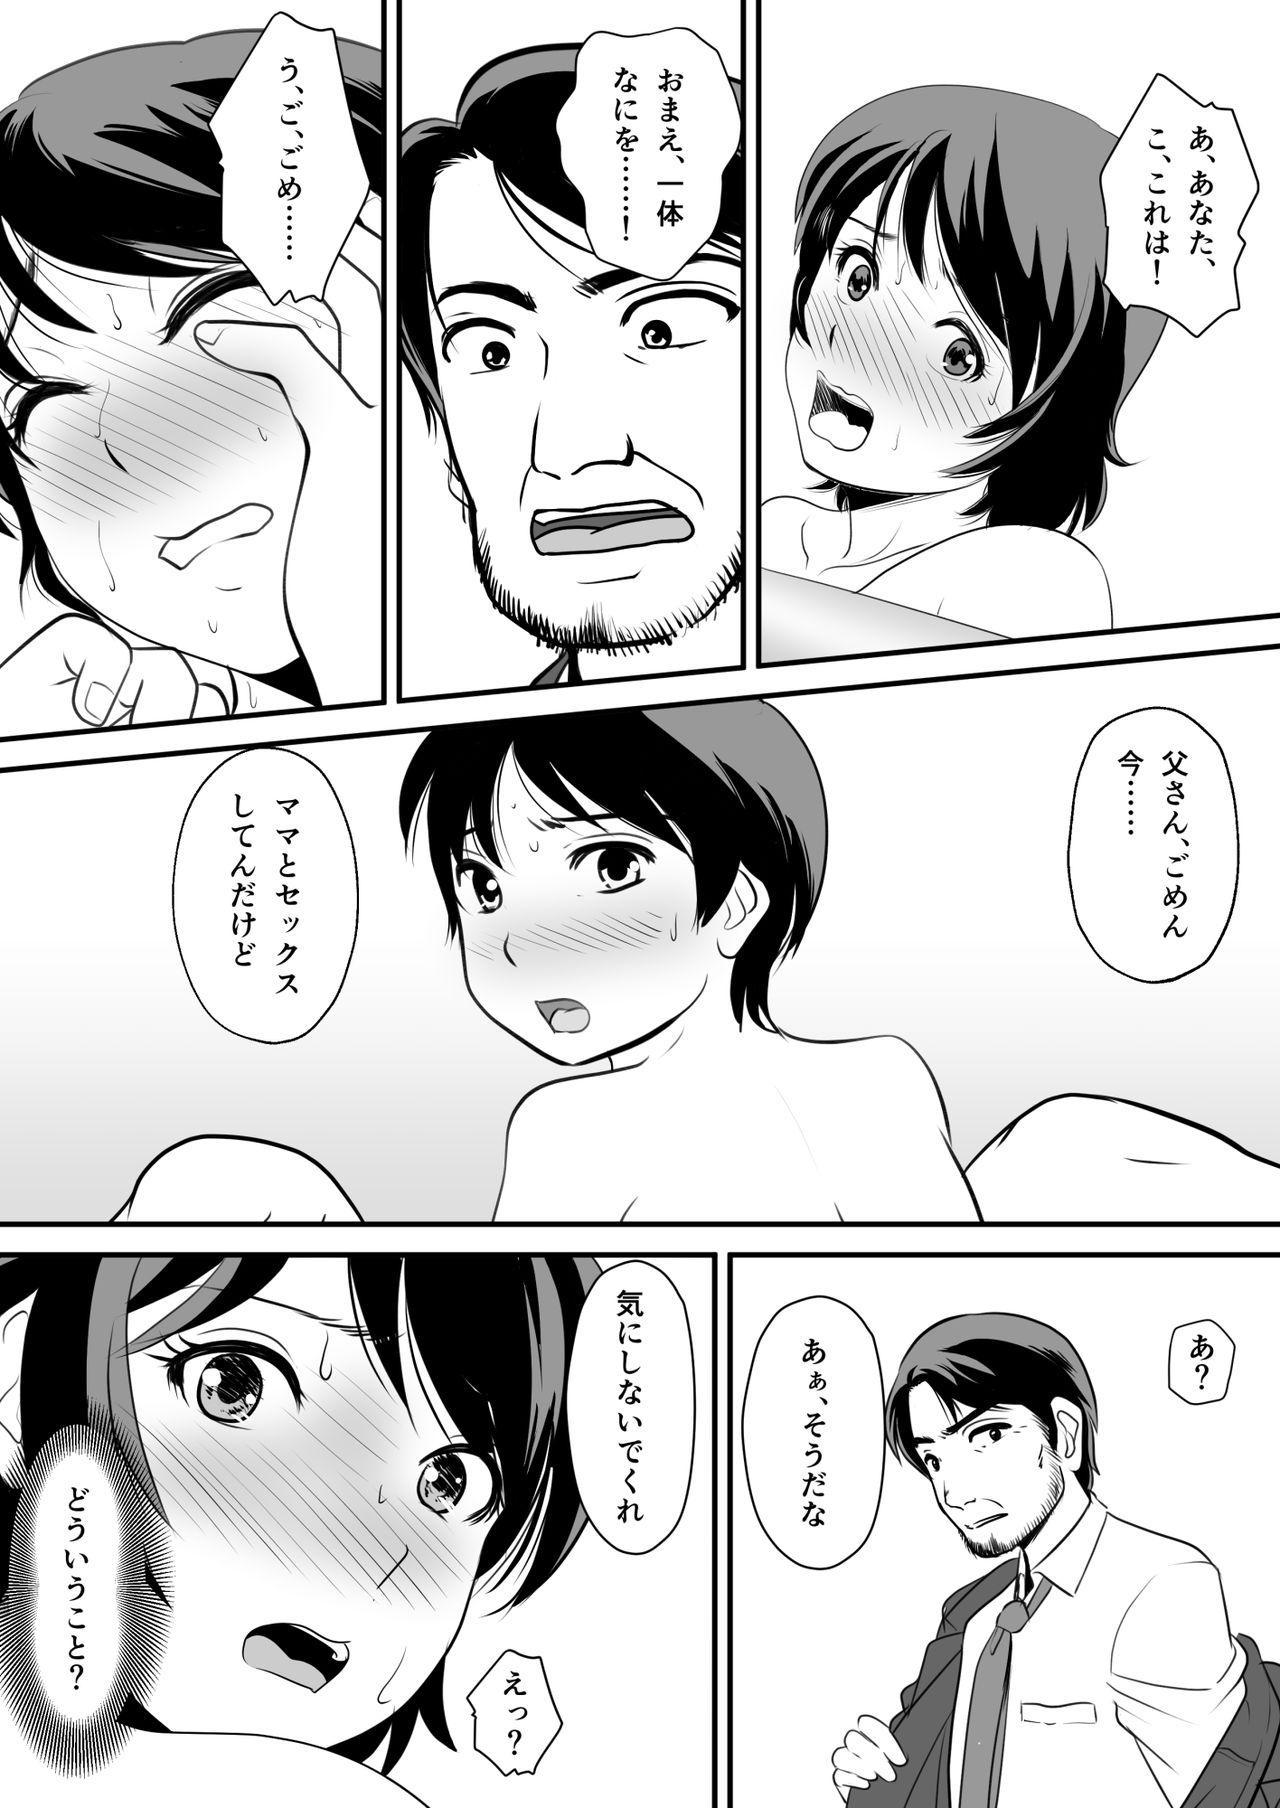 [Milky Club] Netori Appli -Kuso Oyaji kara Kaa-san o Netotta ken- 25